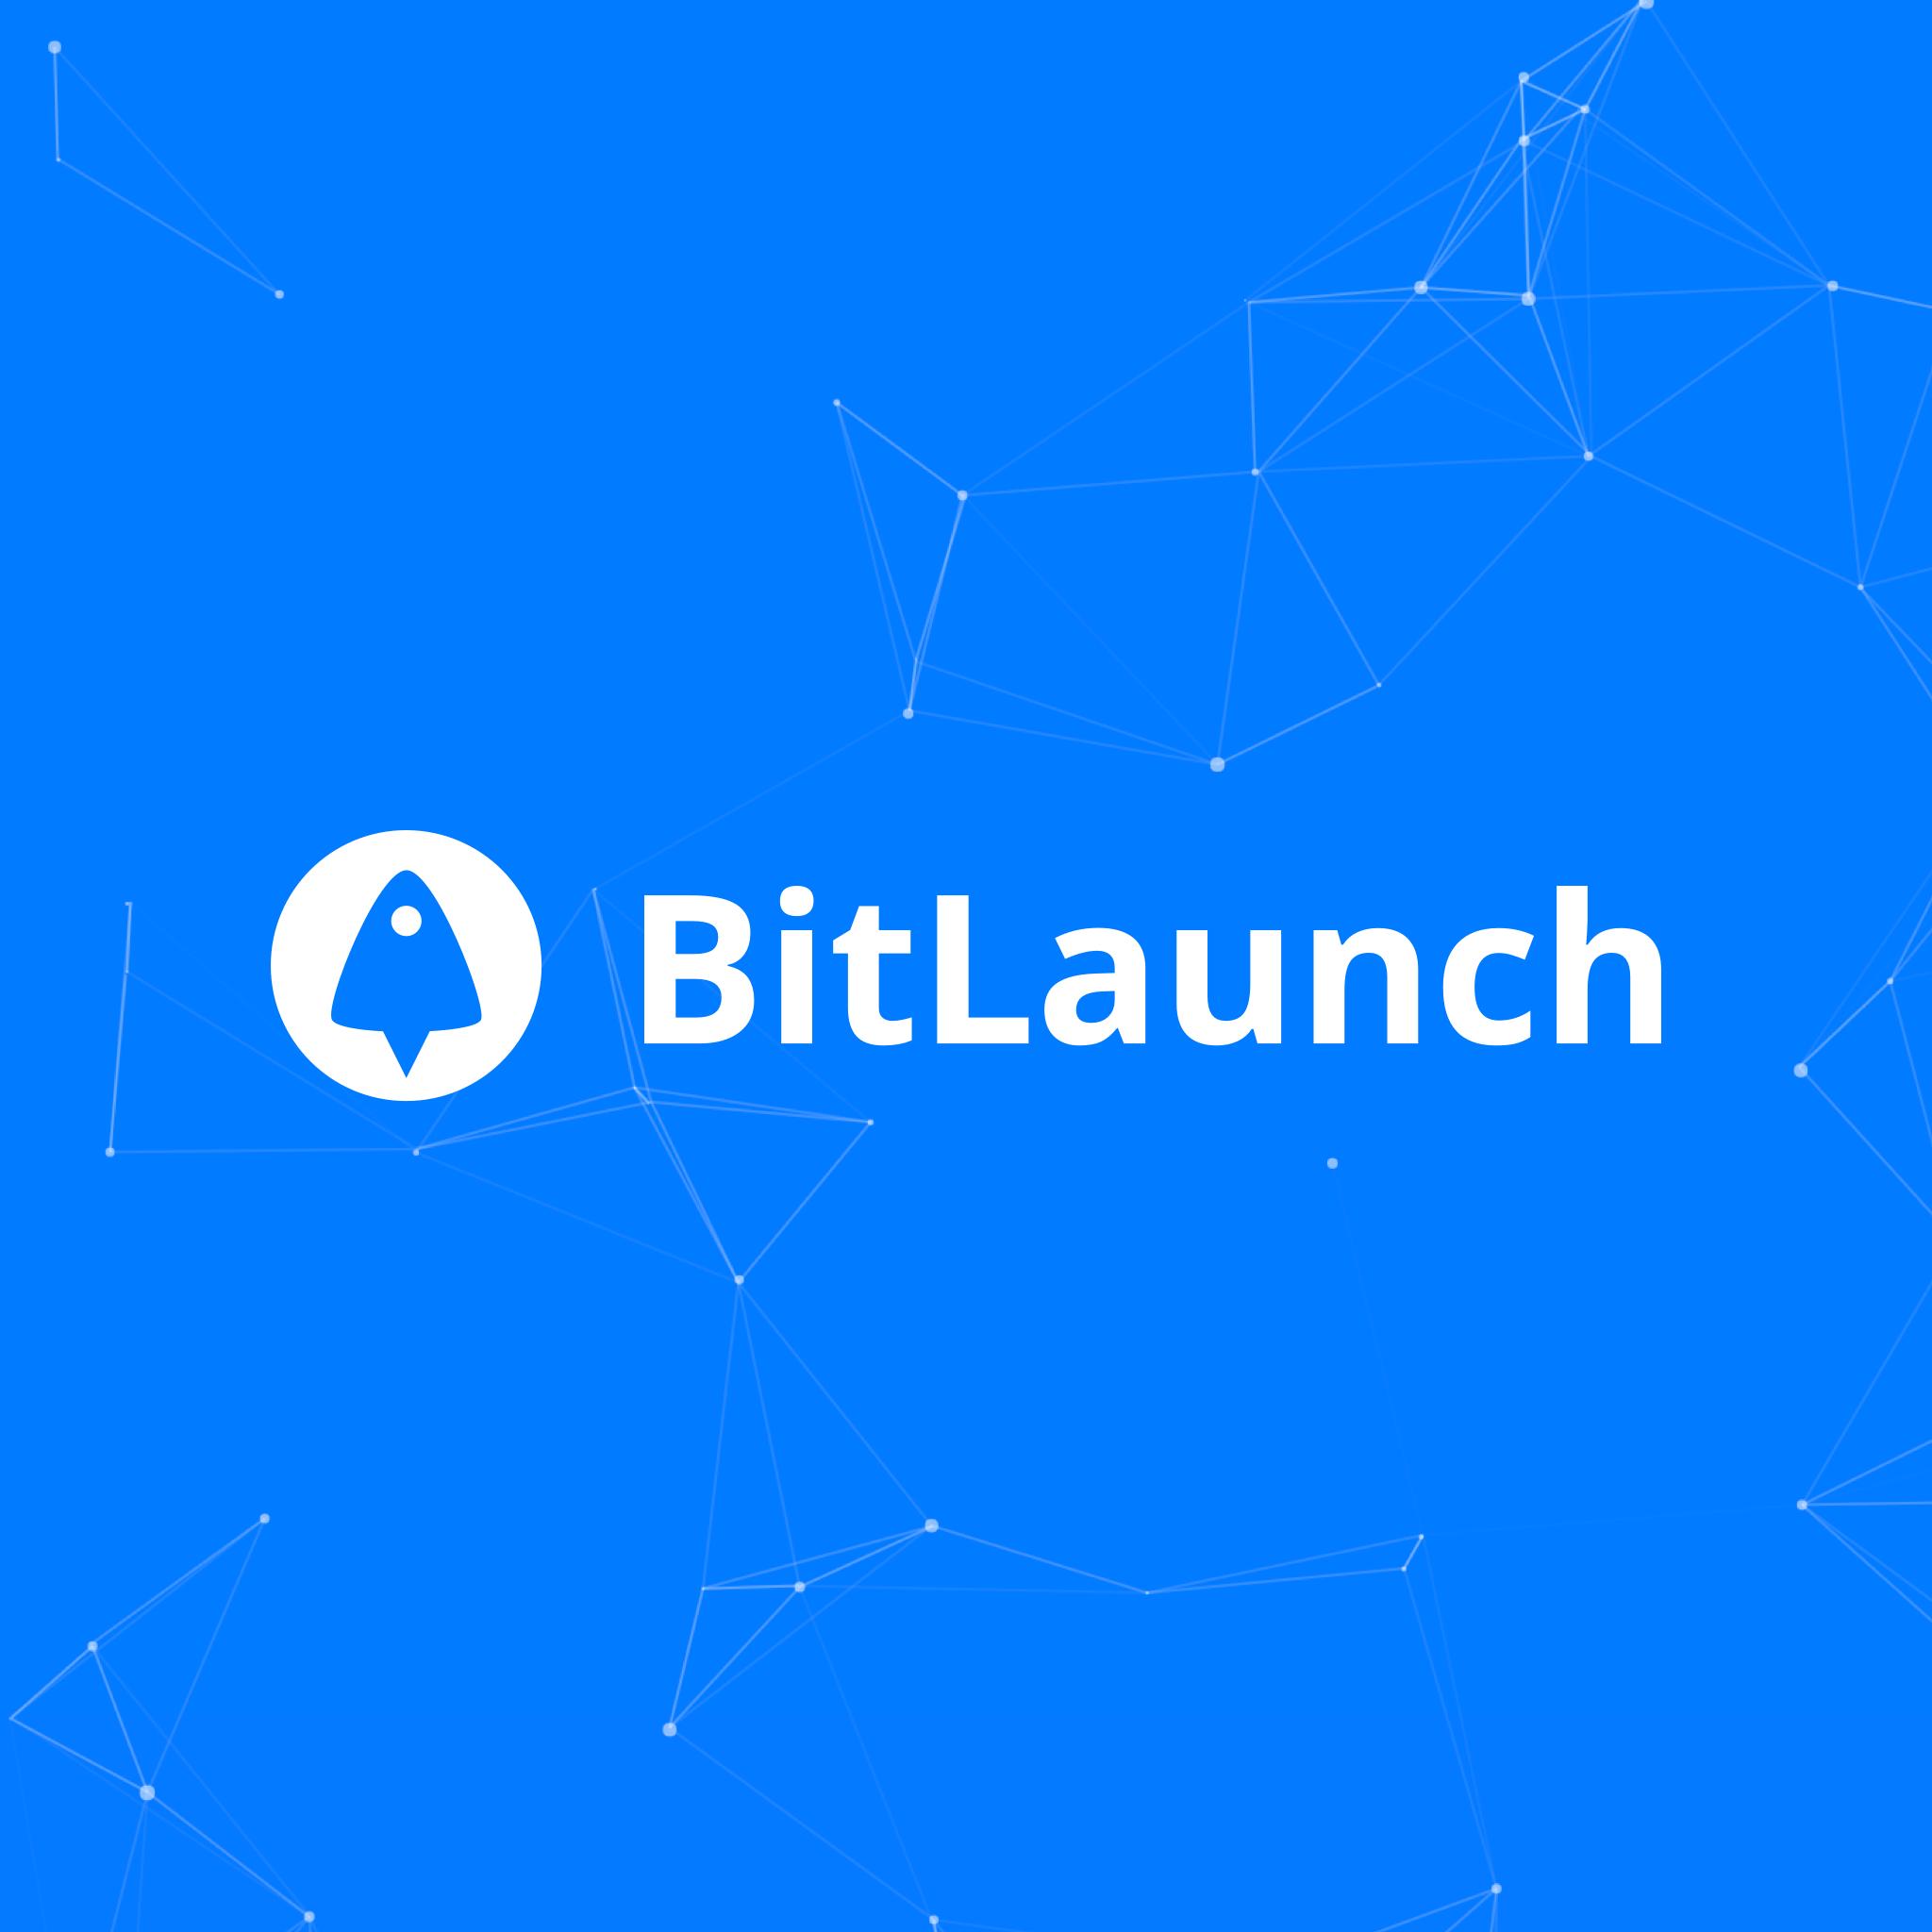 BitLaunch logo